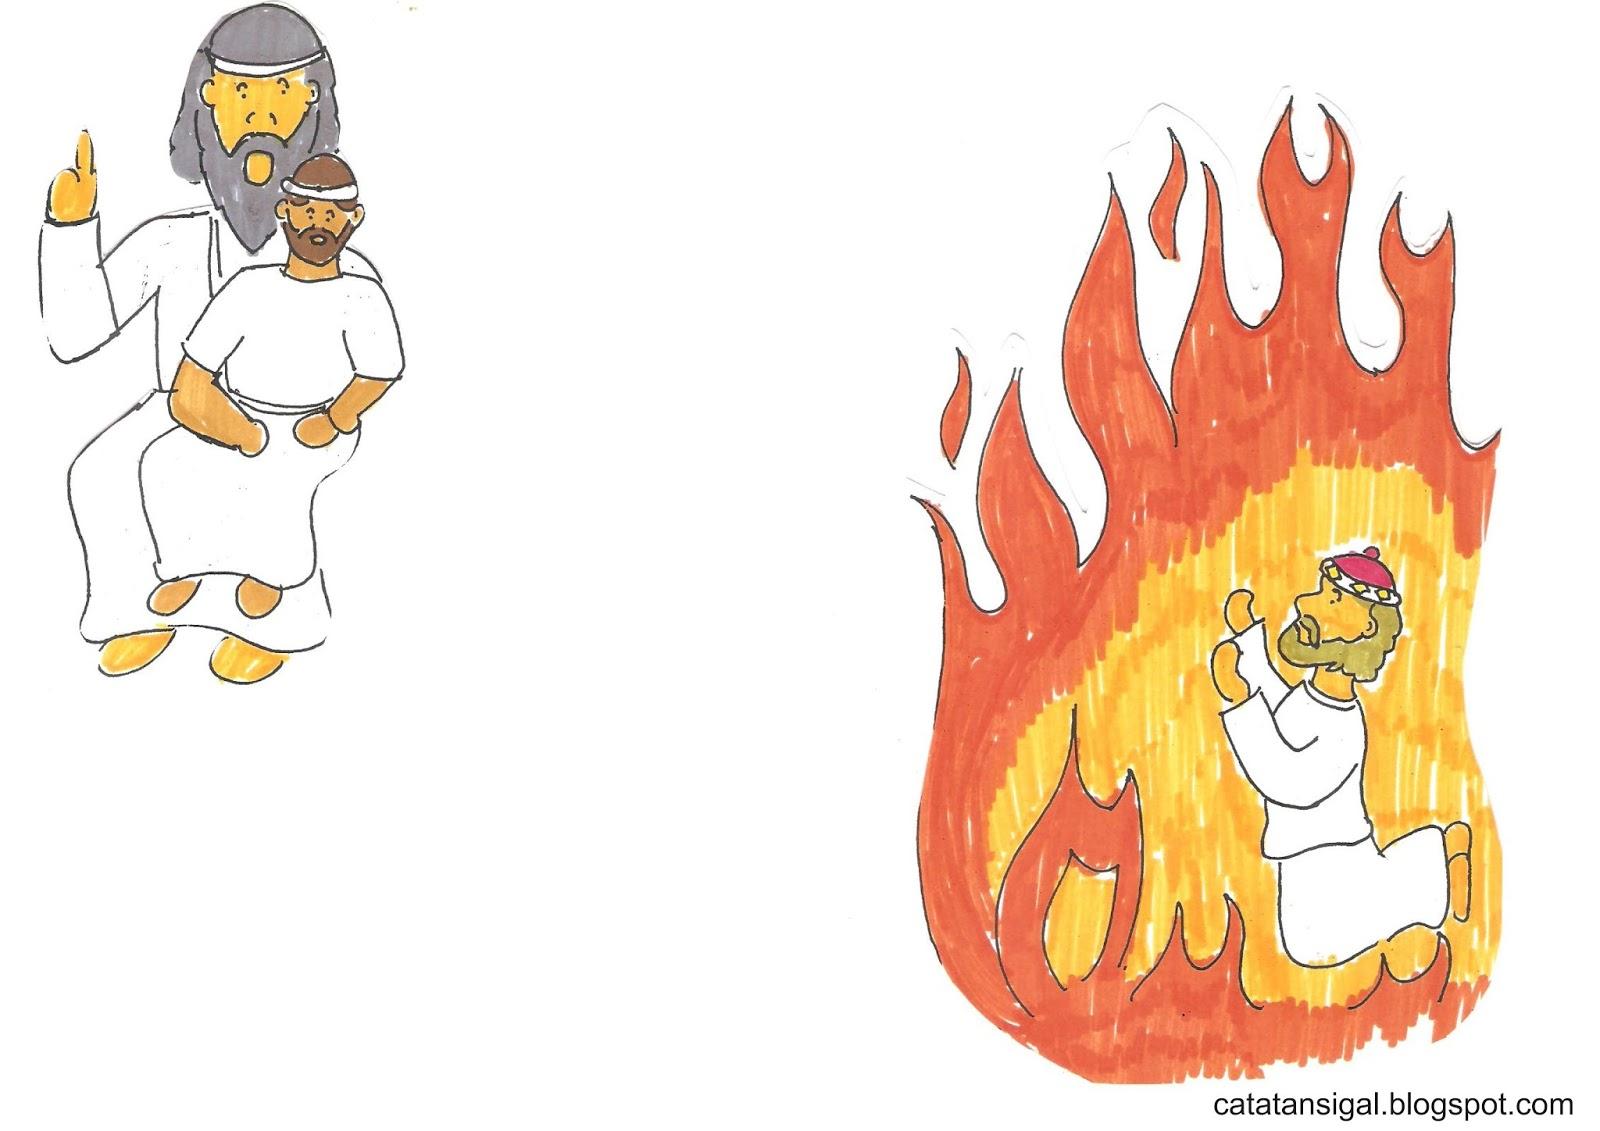 Cerita Bergambar Orang Kaya dan Lazarus